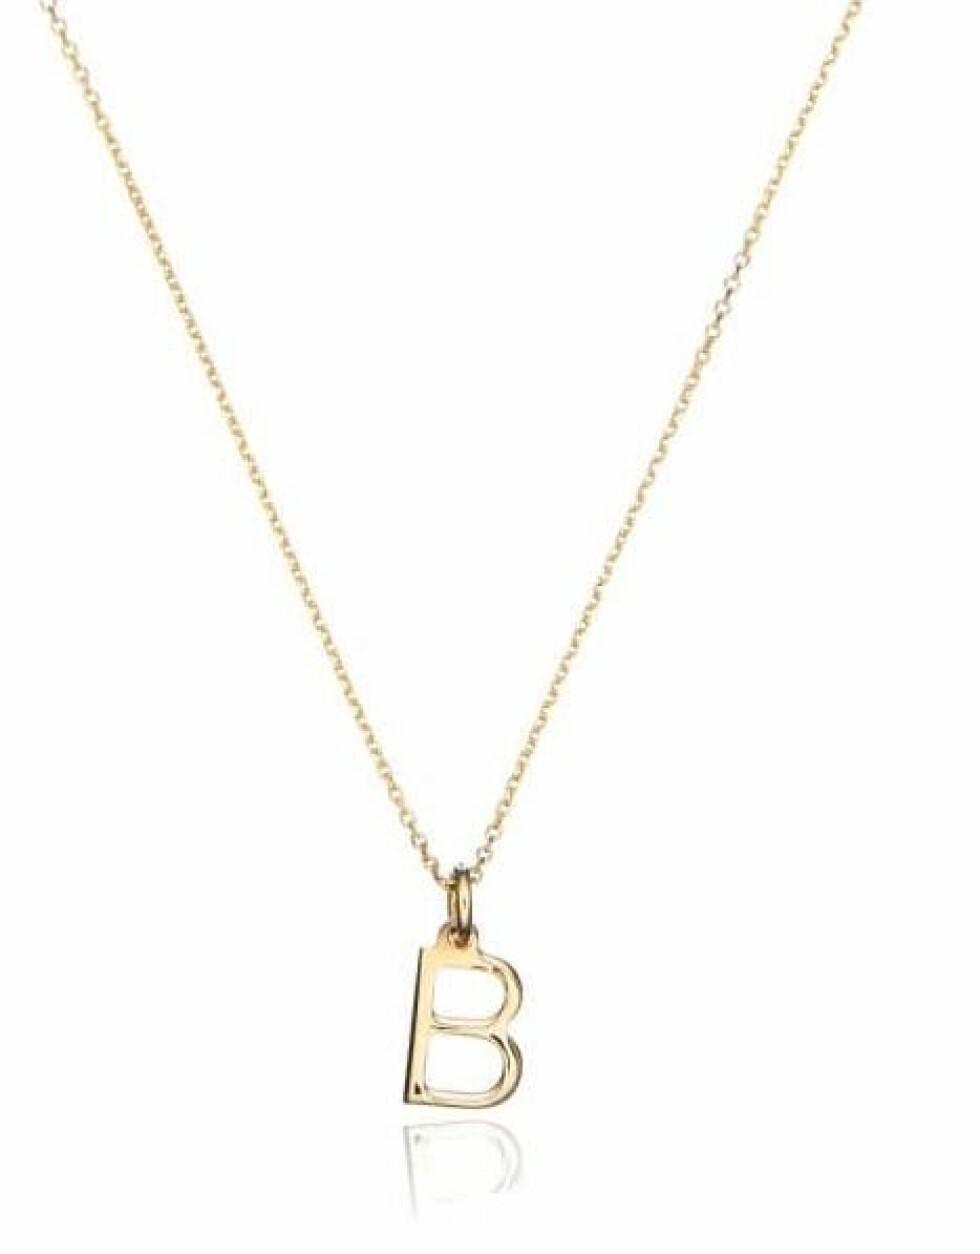 Kjede fra Lily & Roo |1300,-| https://www.wolfandbadger.com/uk/gold-small-initial-letter-charm-necklace/